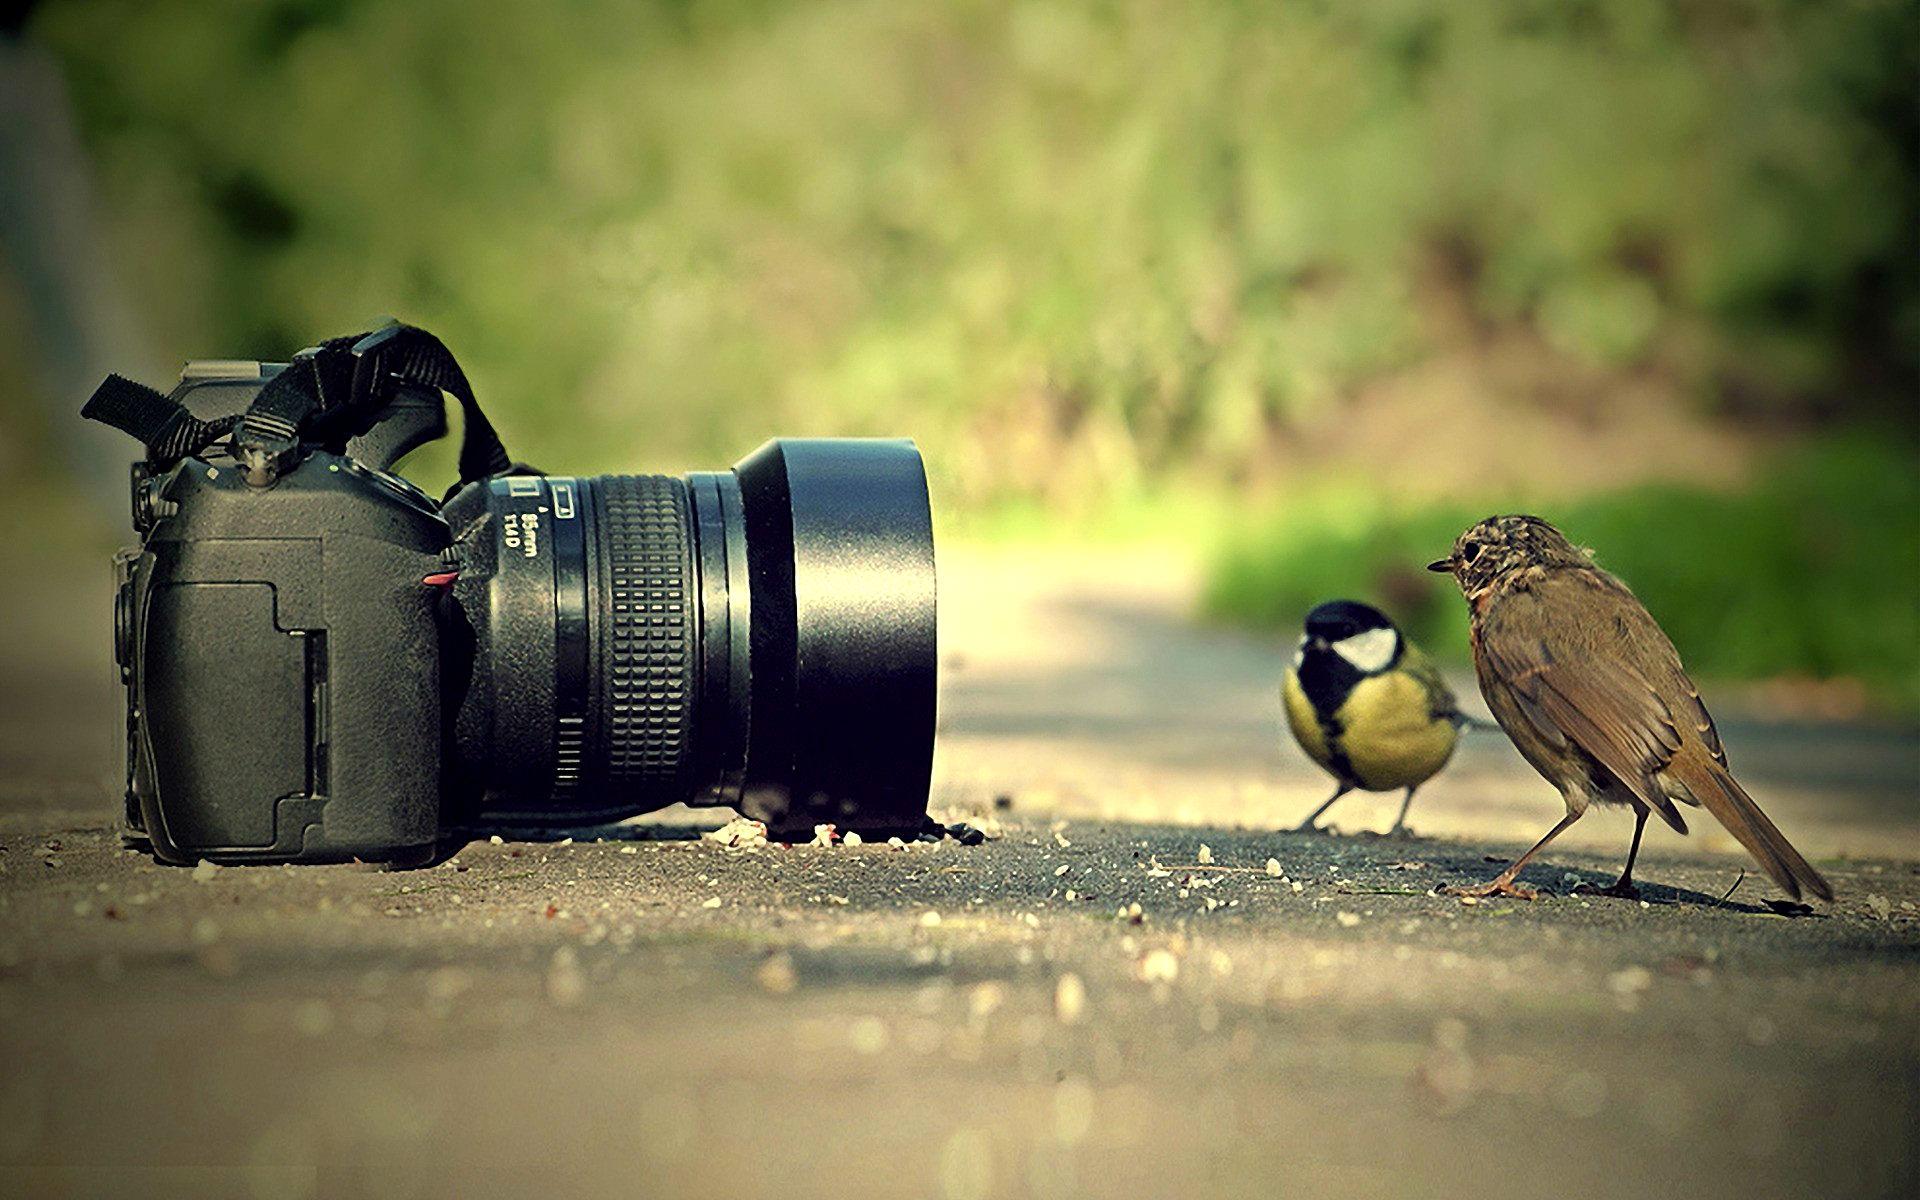 ... Camera Wallpaper; Camera Wallpaper